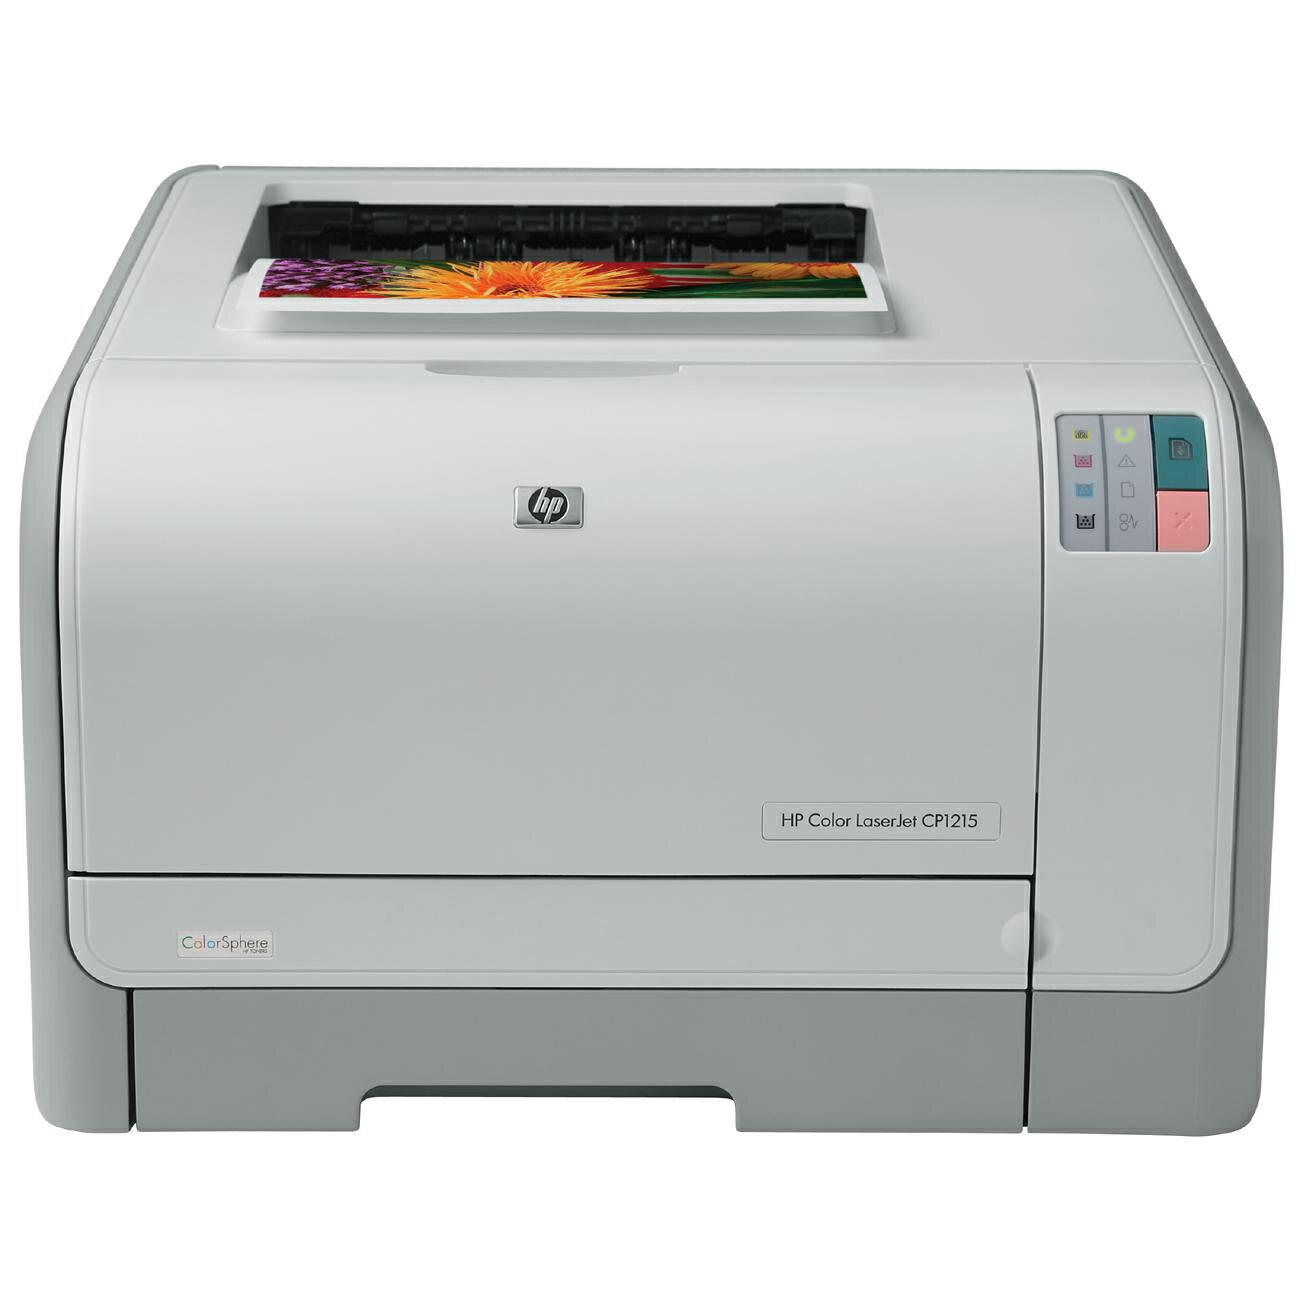 HP LaserJet CP1000 CP1215 Laser Printer - Color - 600 x 600 dpi Print - Photo Print - Desktop - 12 ppm Mono / 8 ppm Color Print - Letter, Legal, Executive, Envelope No. 10, Monarch Envelope, Custom Size - 150 sheets Standard Input Capacity - 25000 Duty Cy 0